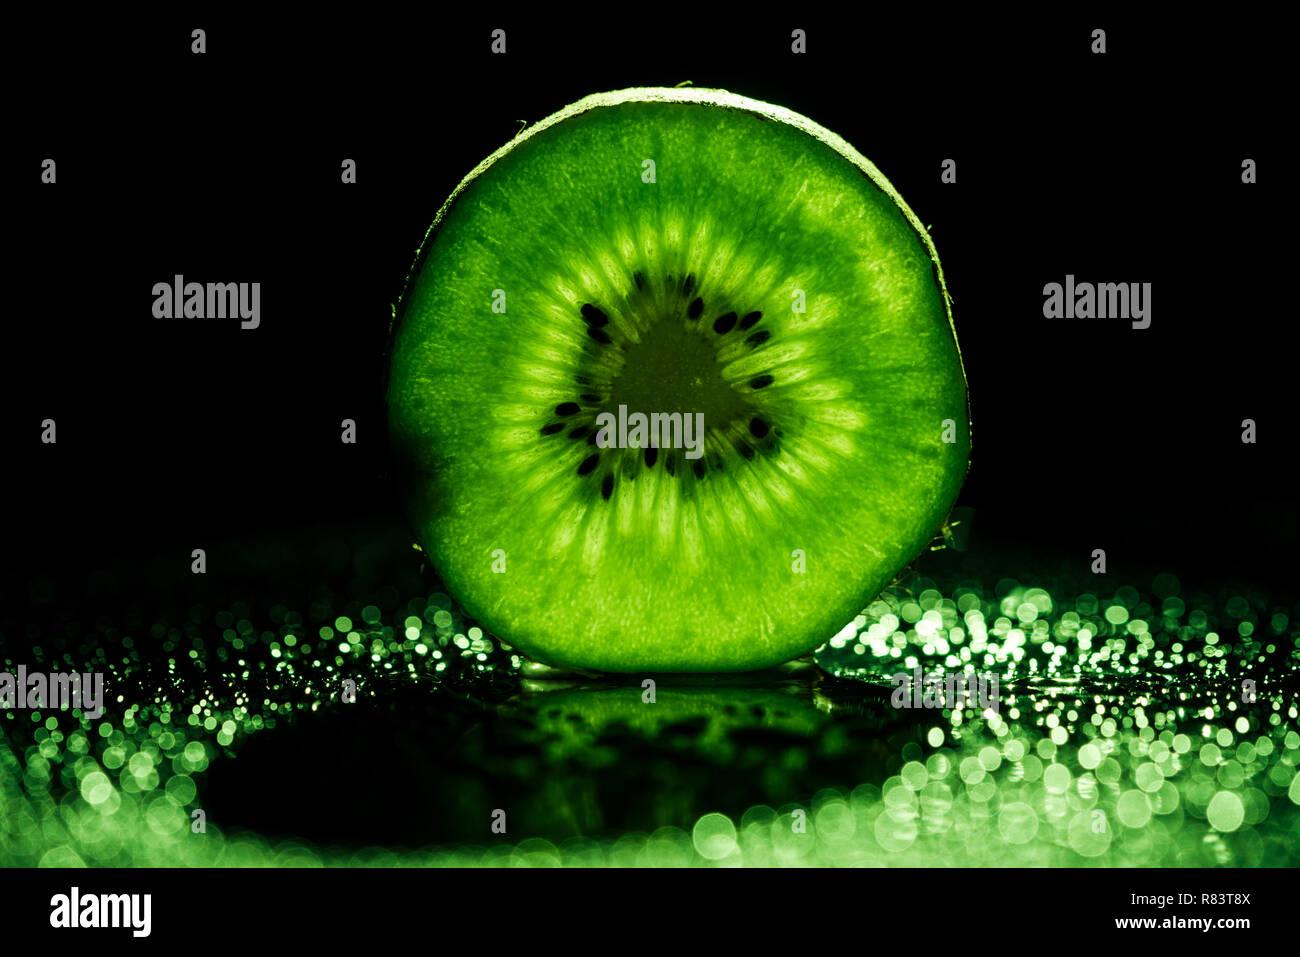 slice of kiwi fruit on black background with neon green backlit - Stock Image